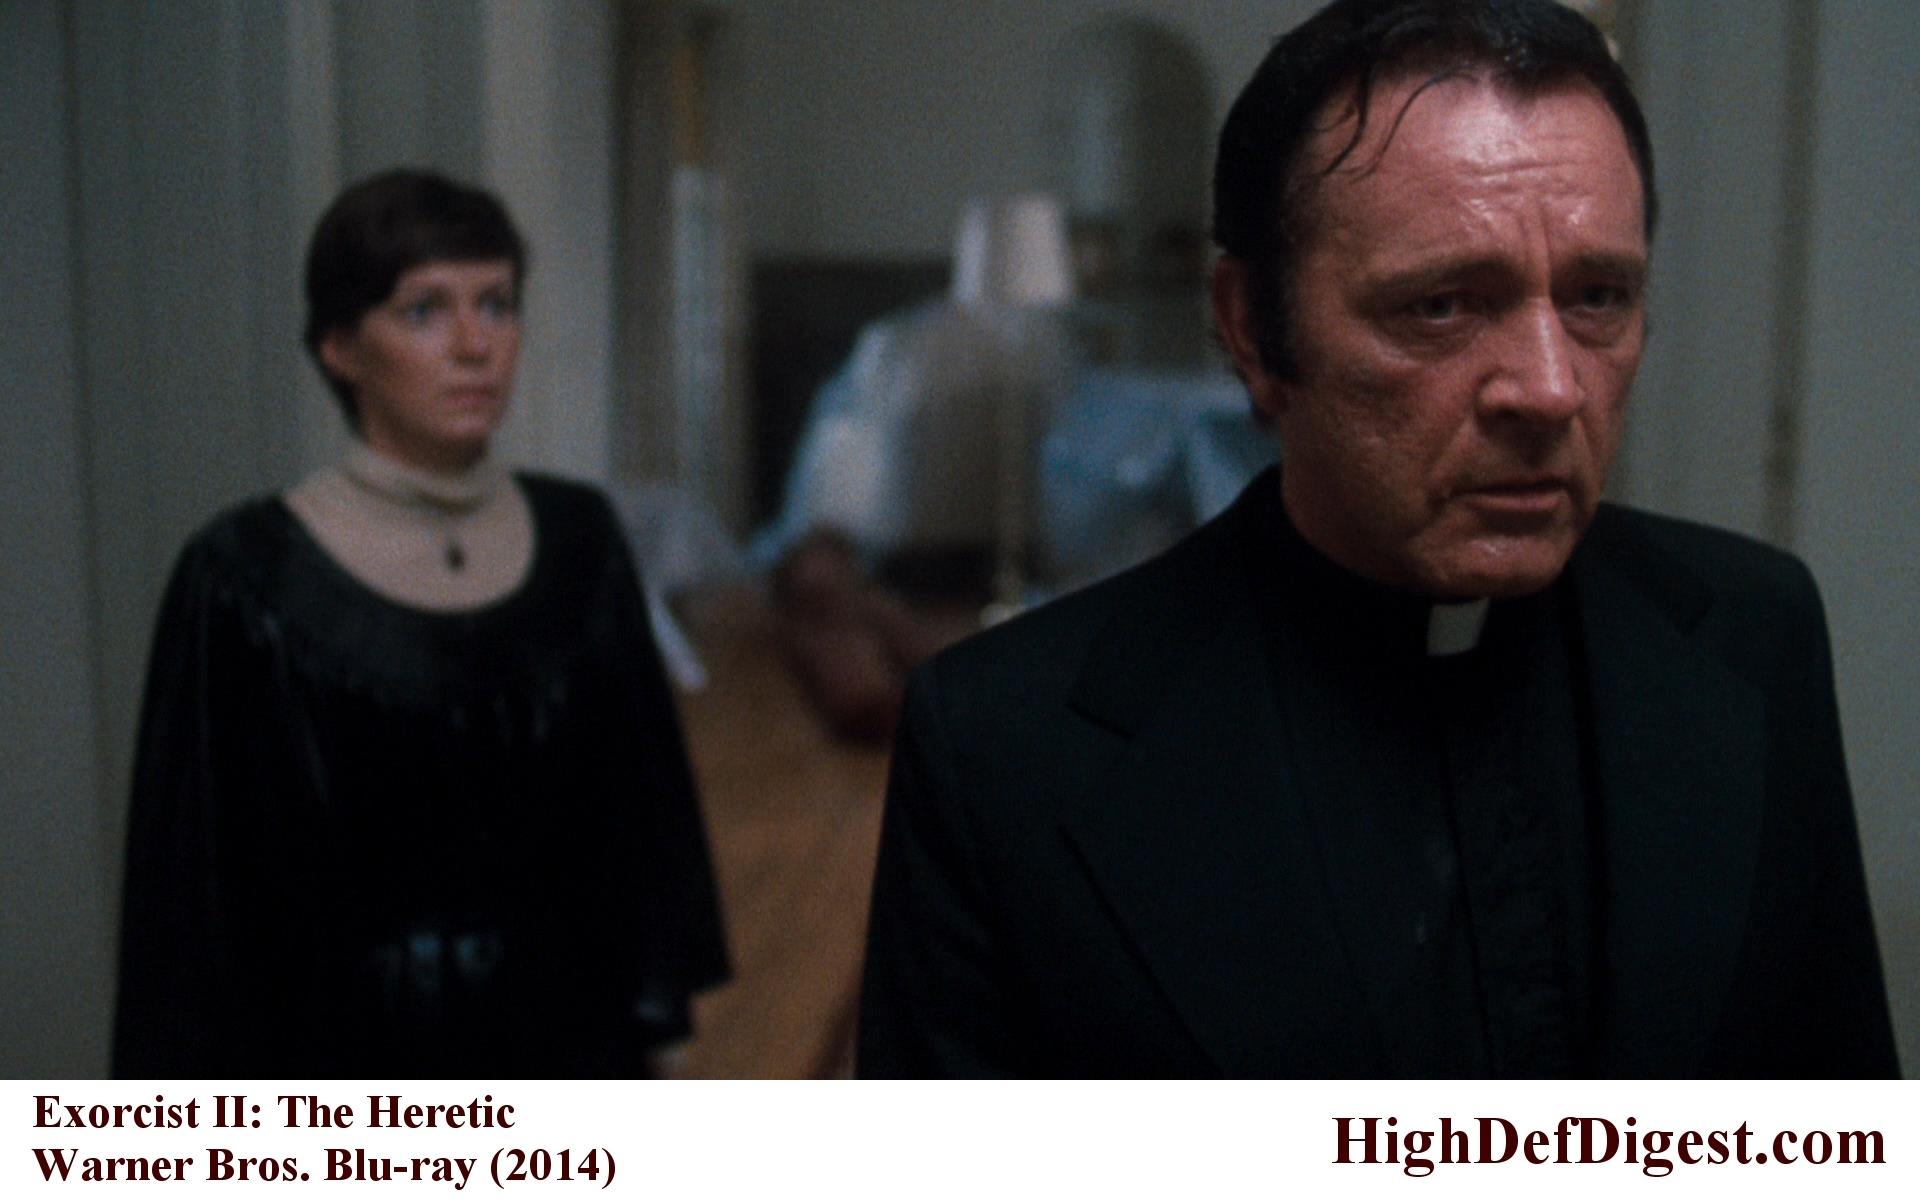 Exorcist II - Richard Burton Comparison (Warner Bros.)